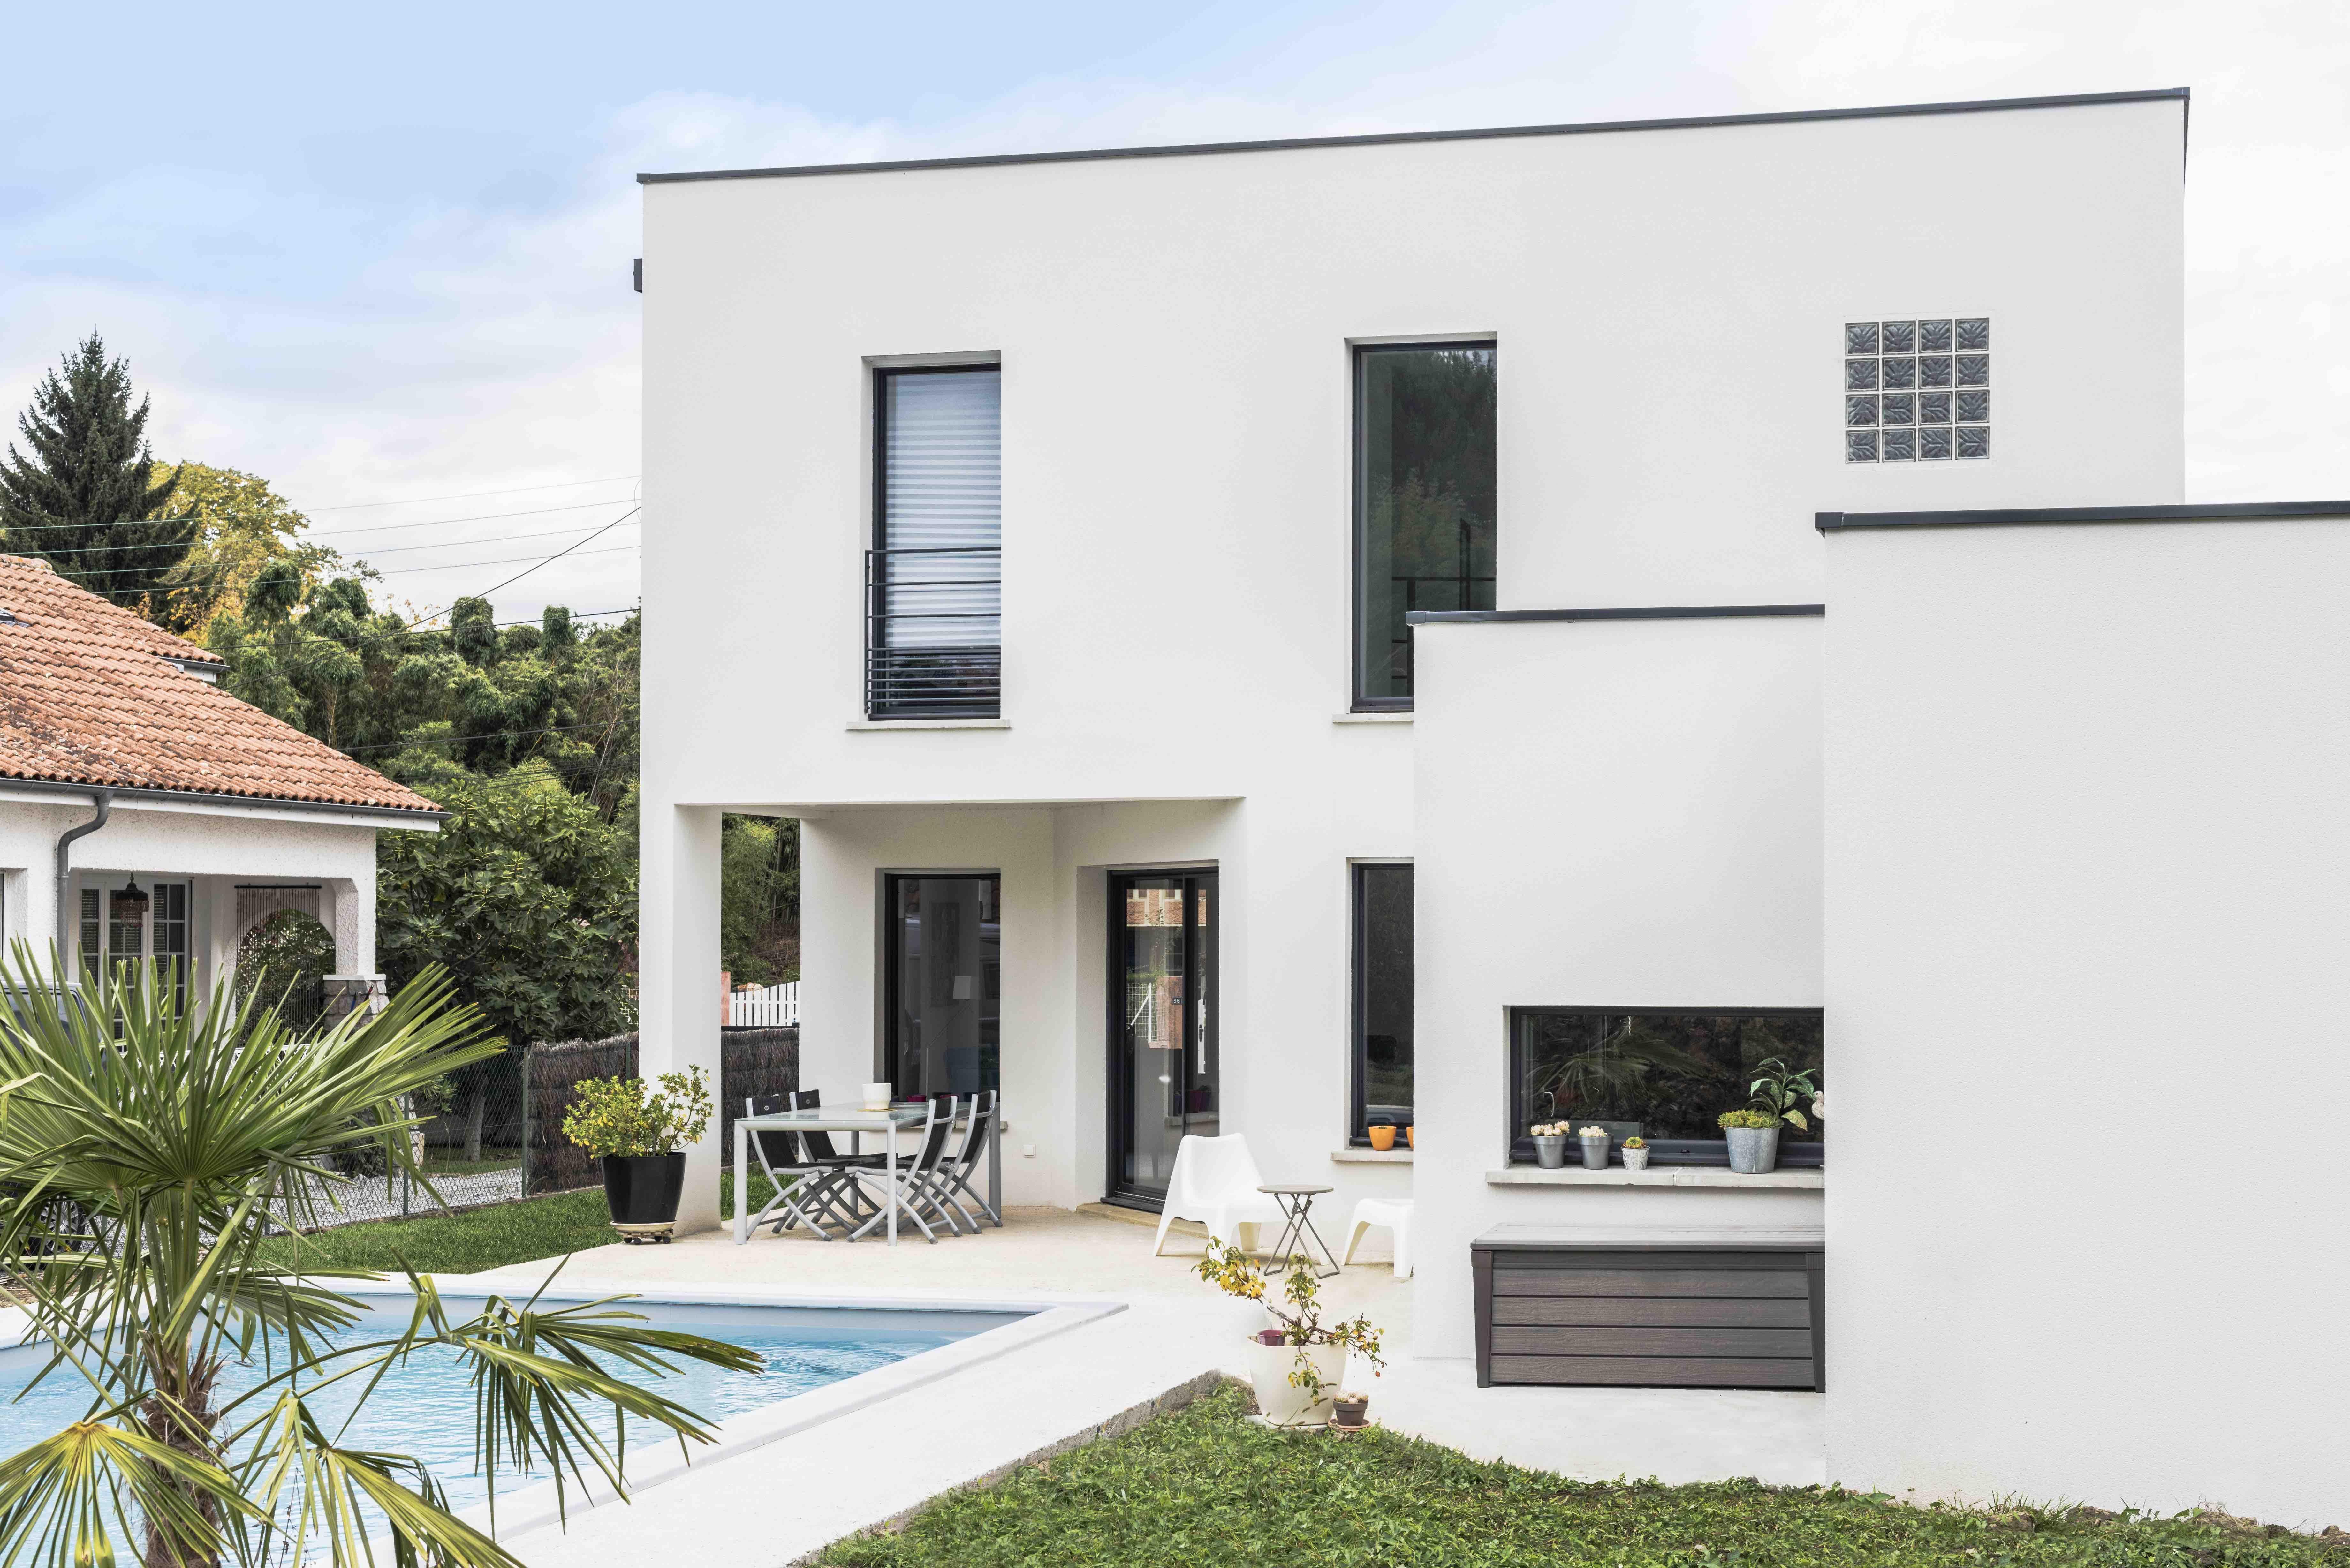 construction maison individuelle pays basque ventana blog. Black Bedroom Furniture Sets. Home Design Ideas